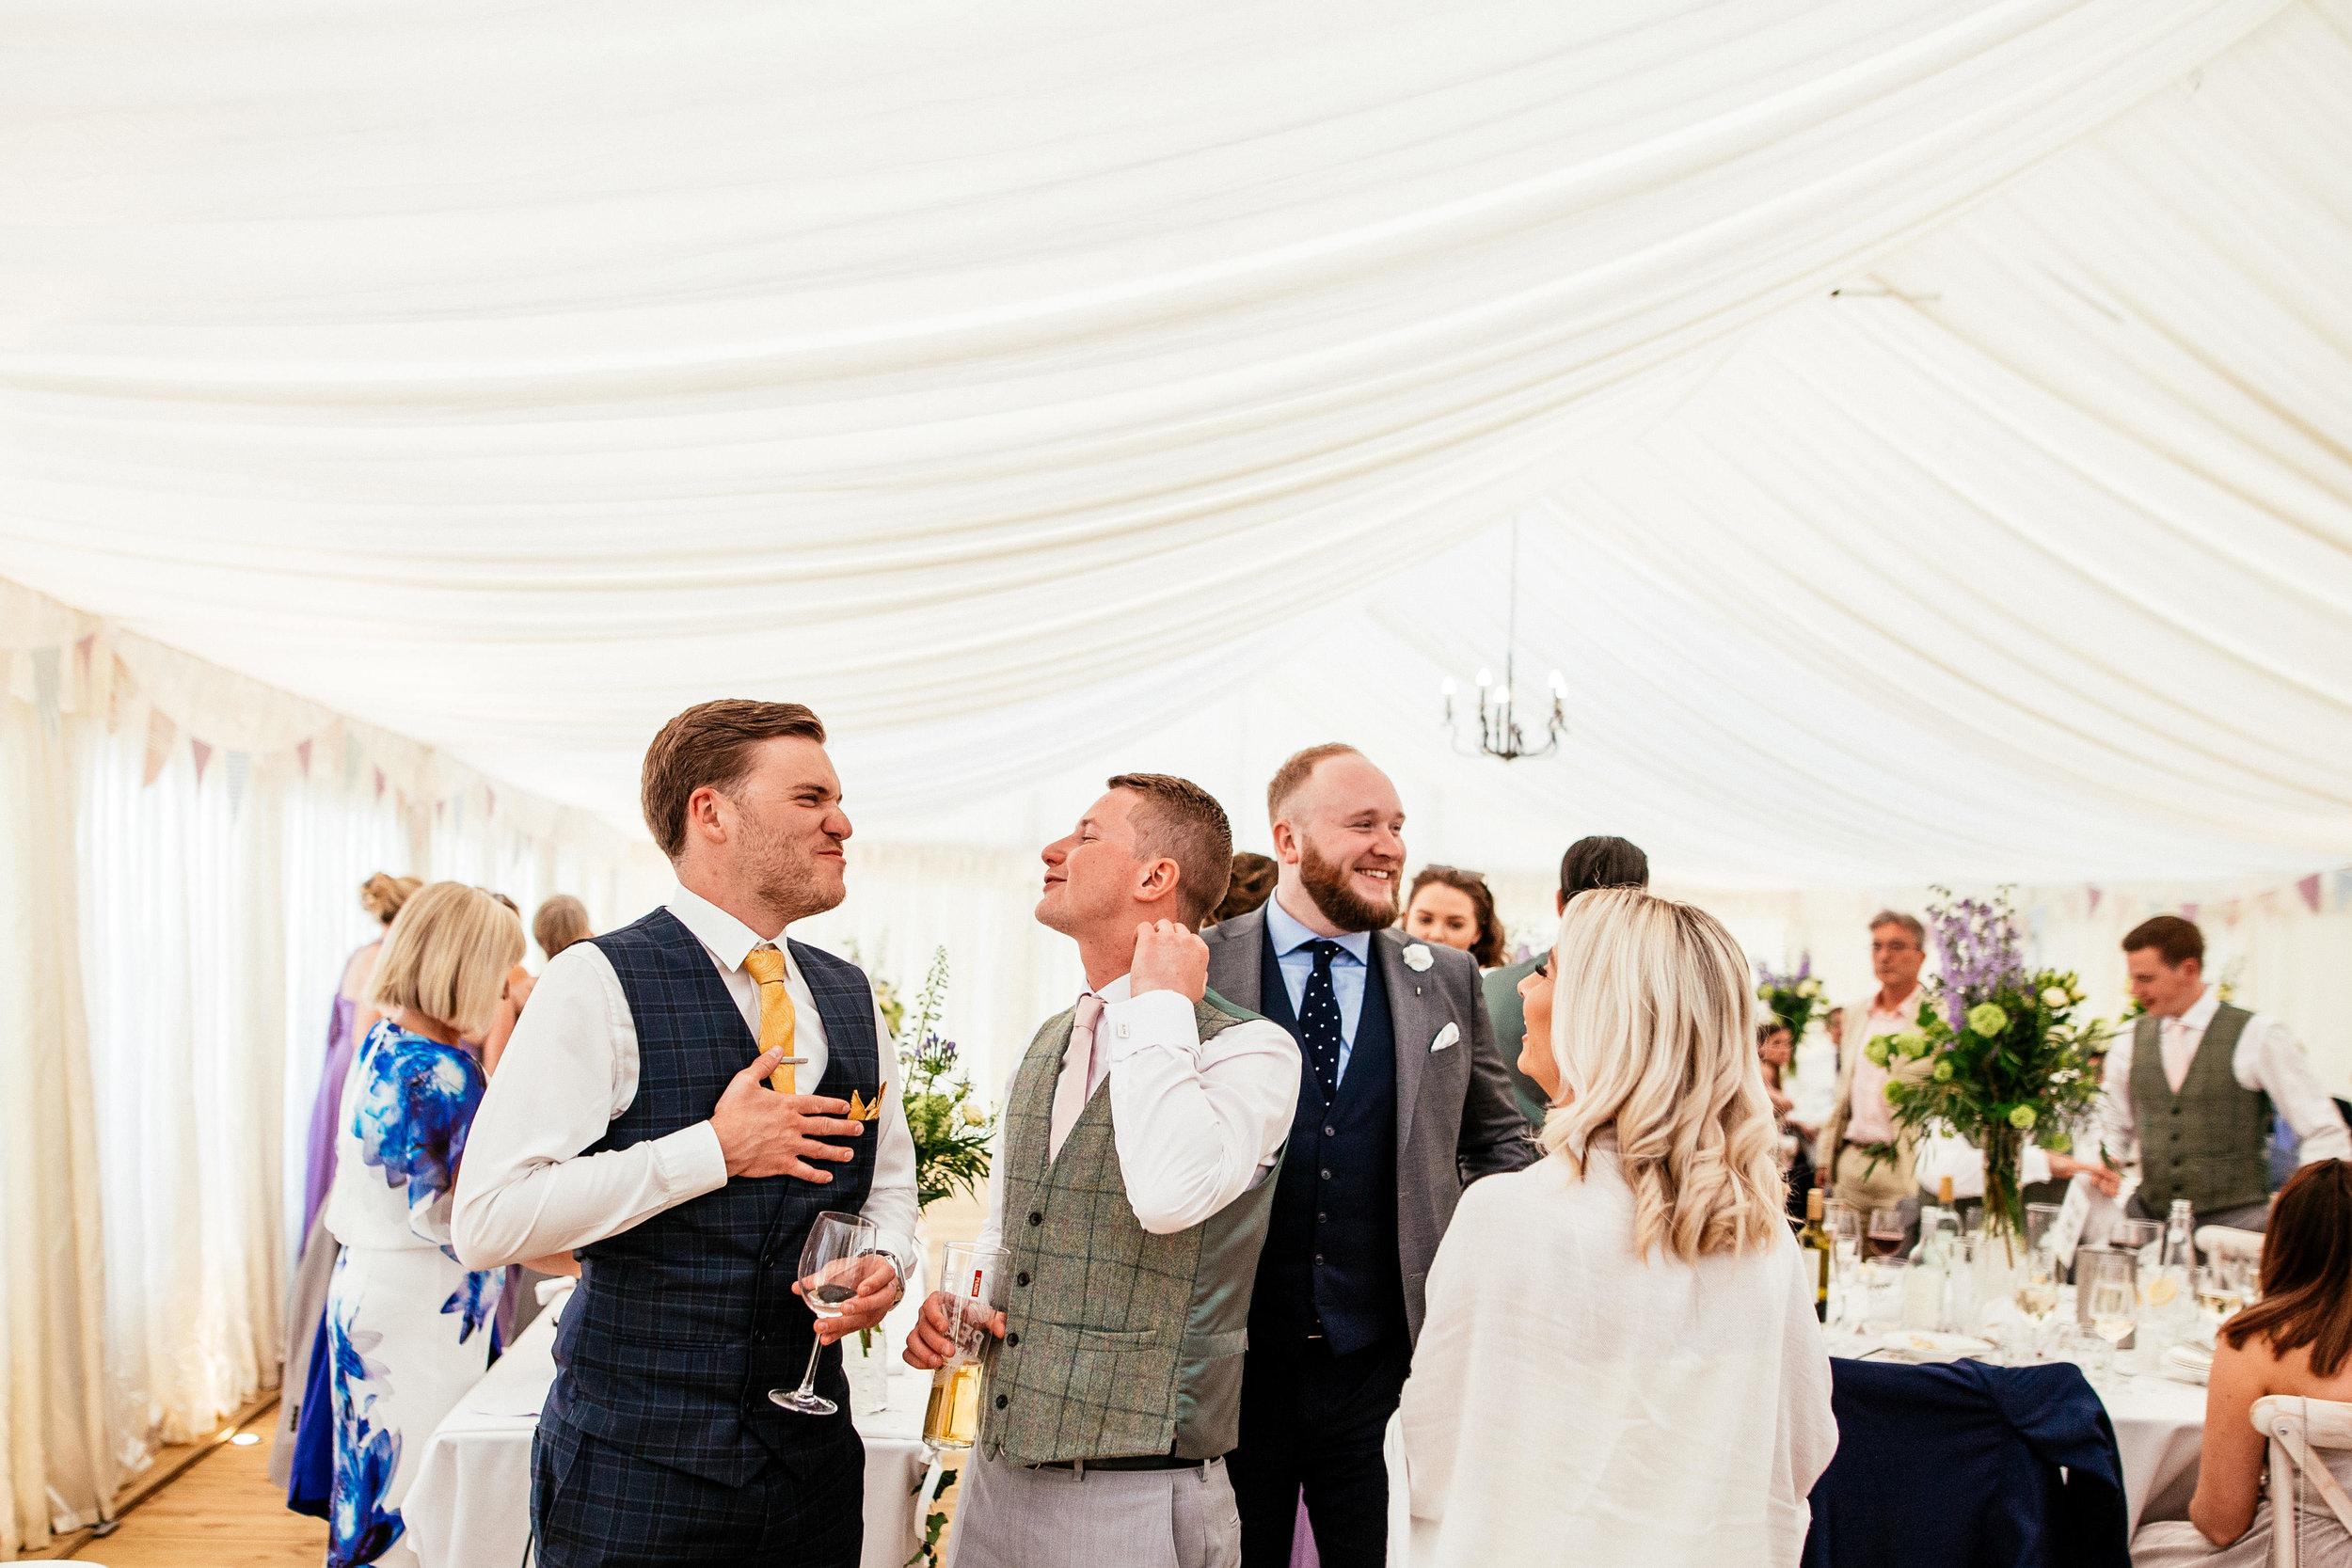 Becky-and-Sam-Wedding-Highlights-70.jpg